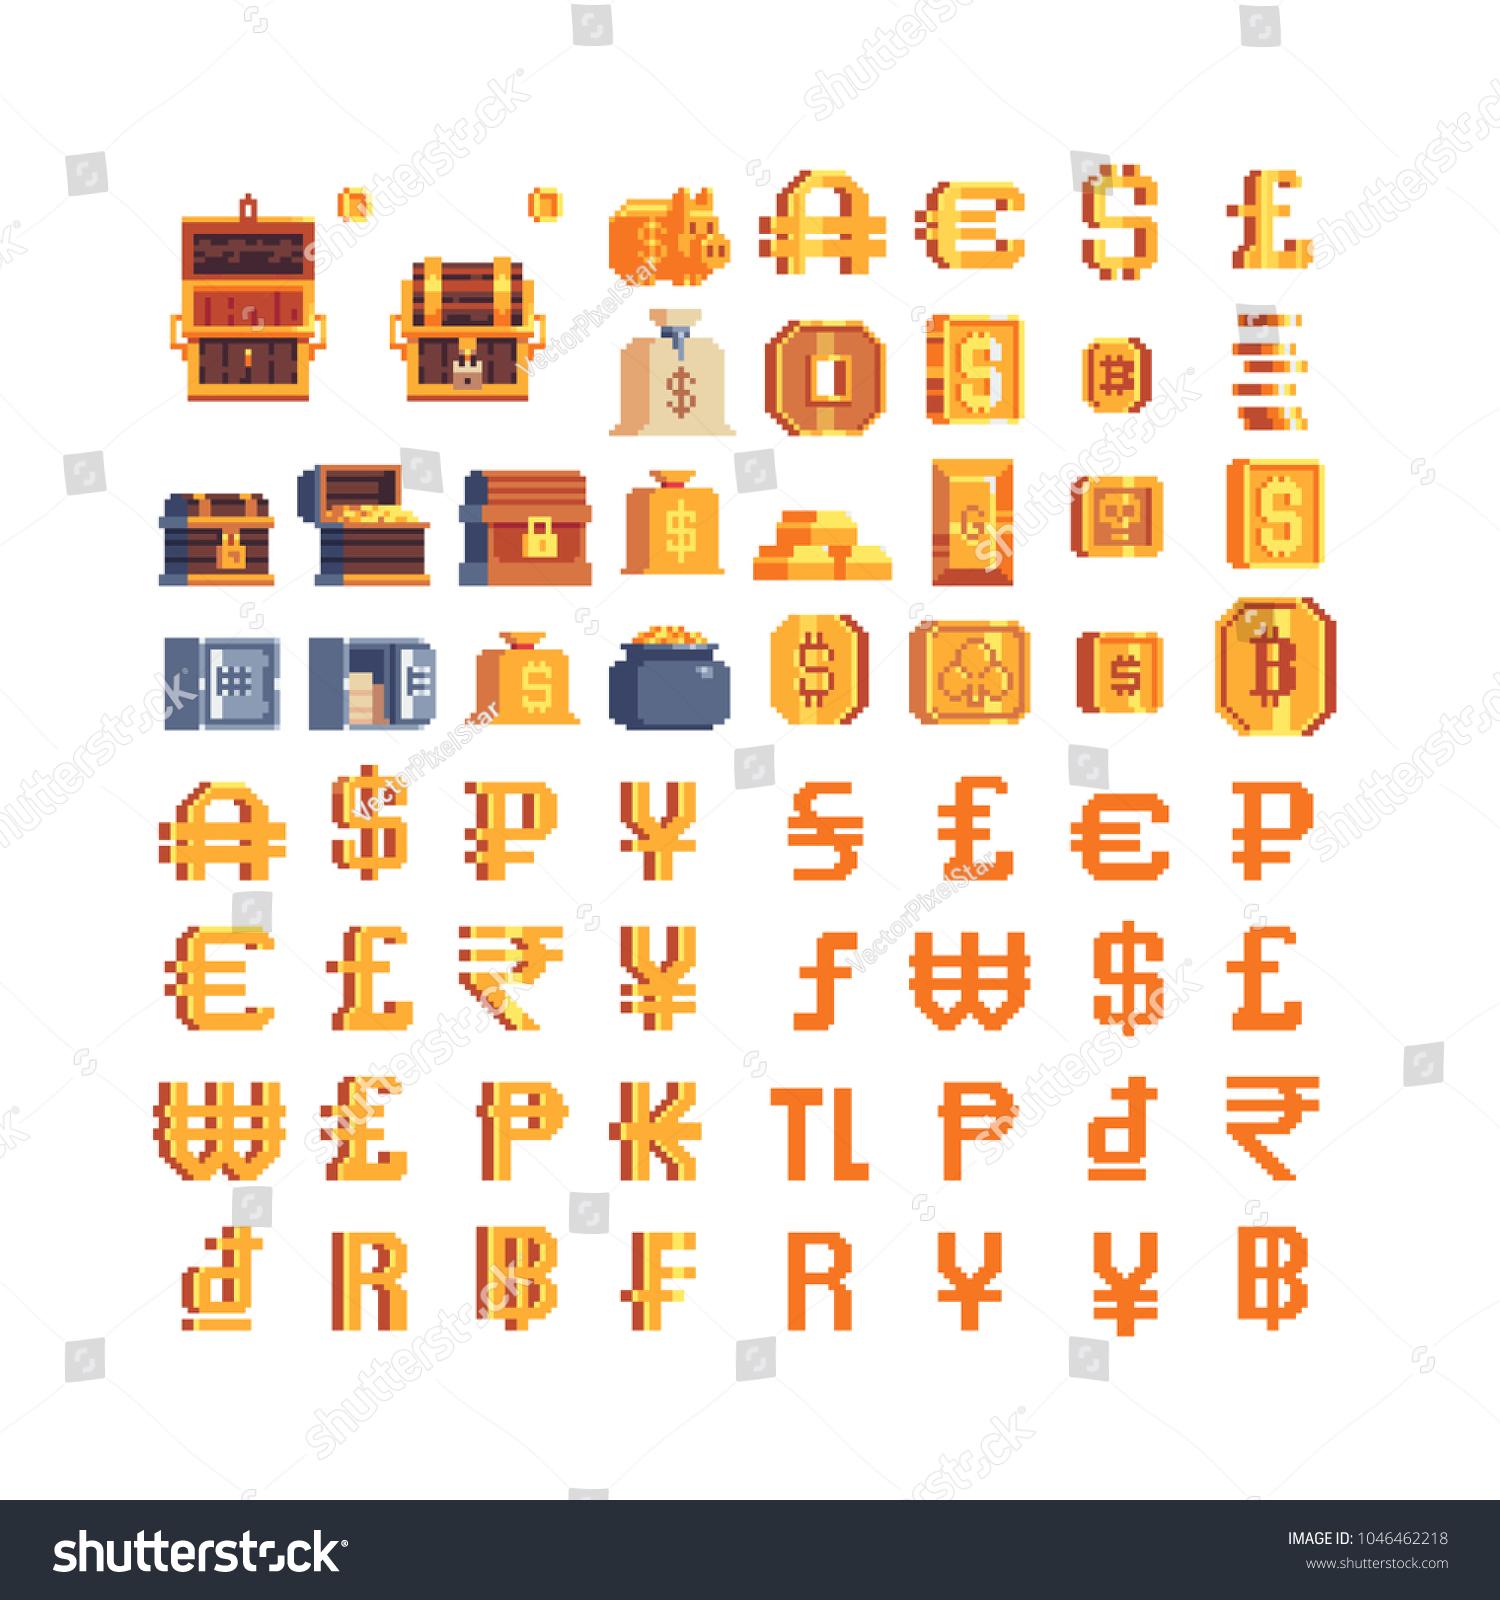 World gold money pixel art icons stock vector 1046462218 shutterstock world gold money pixel art icons set currency symbols dollar bitcoin euro buycottarizona Choice Image